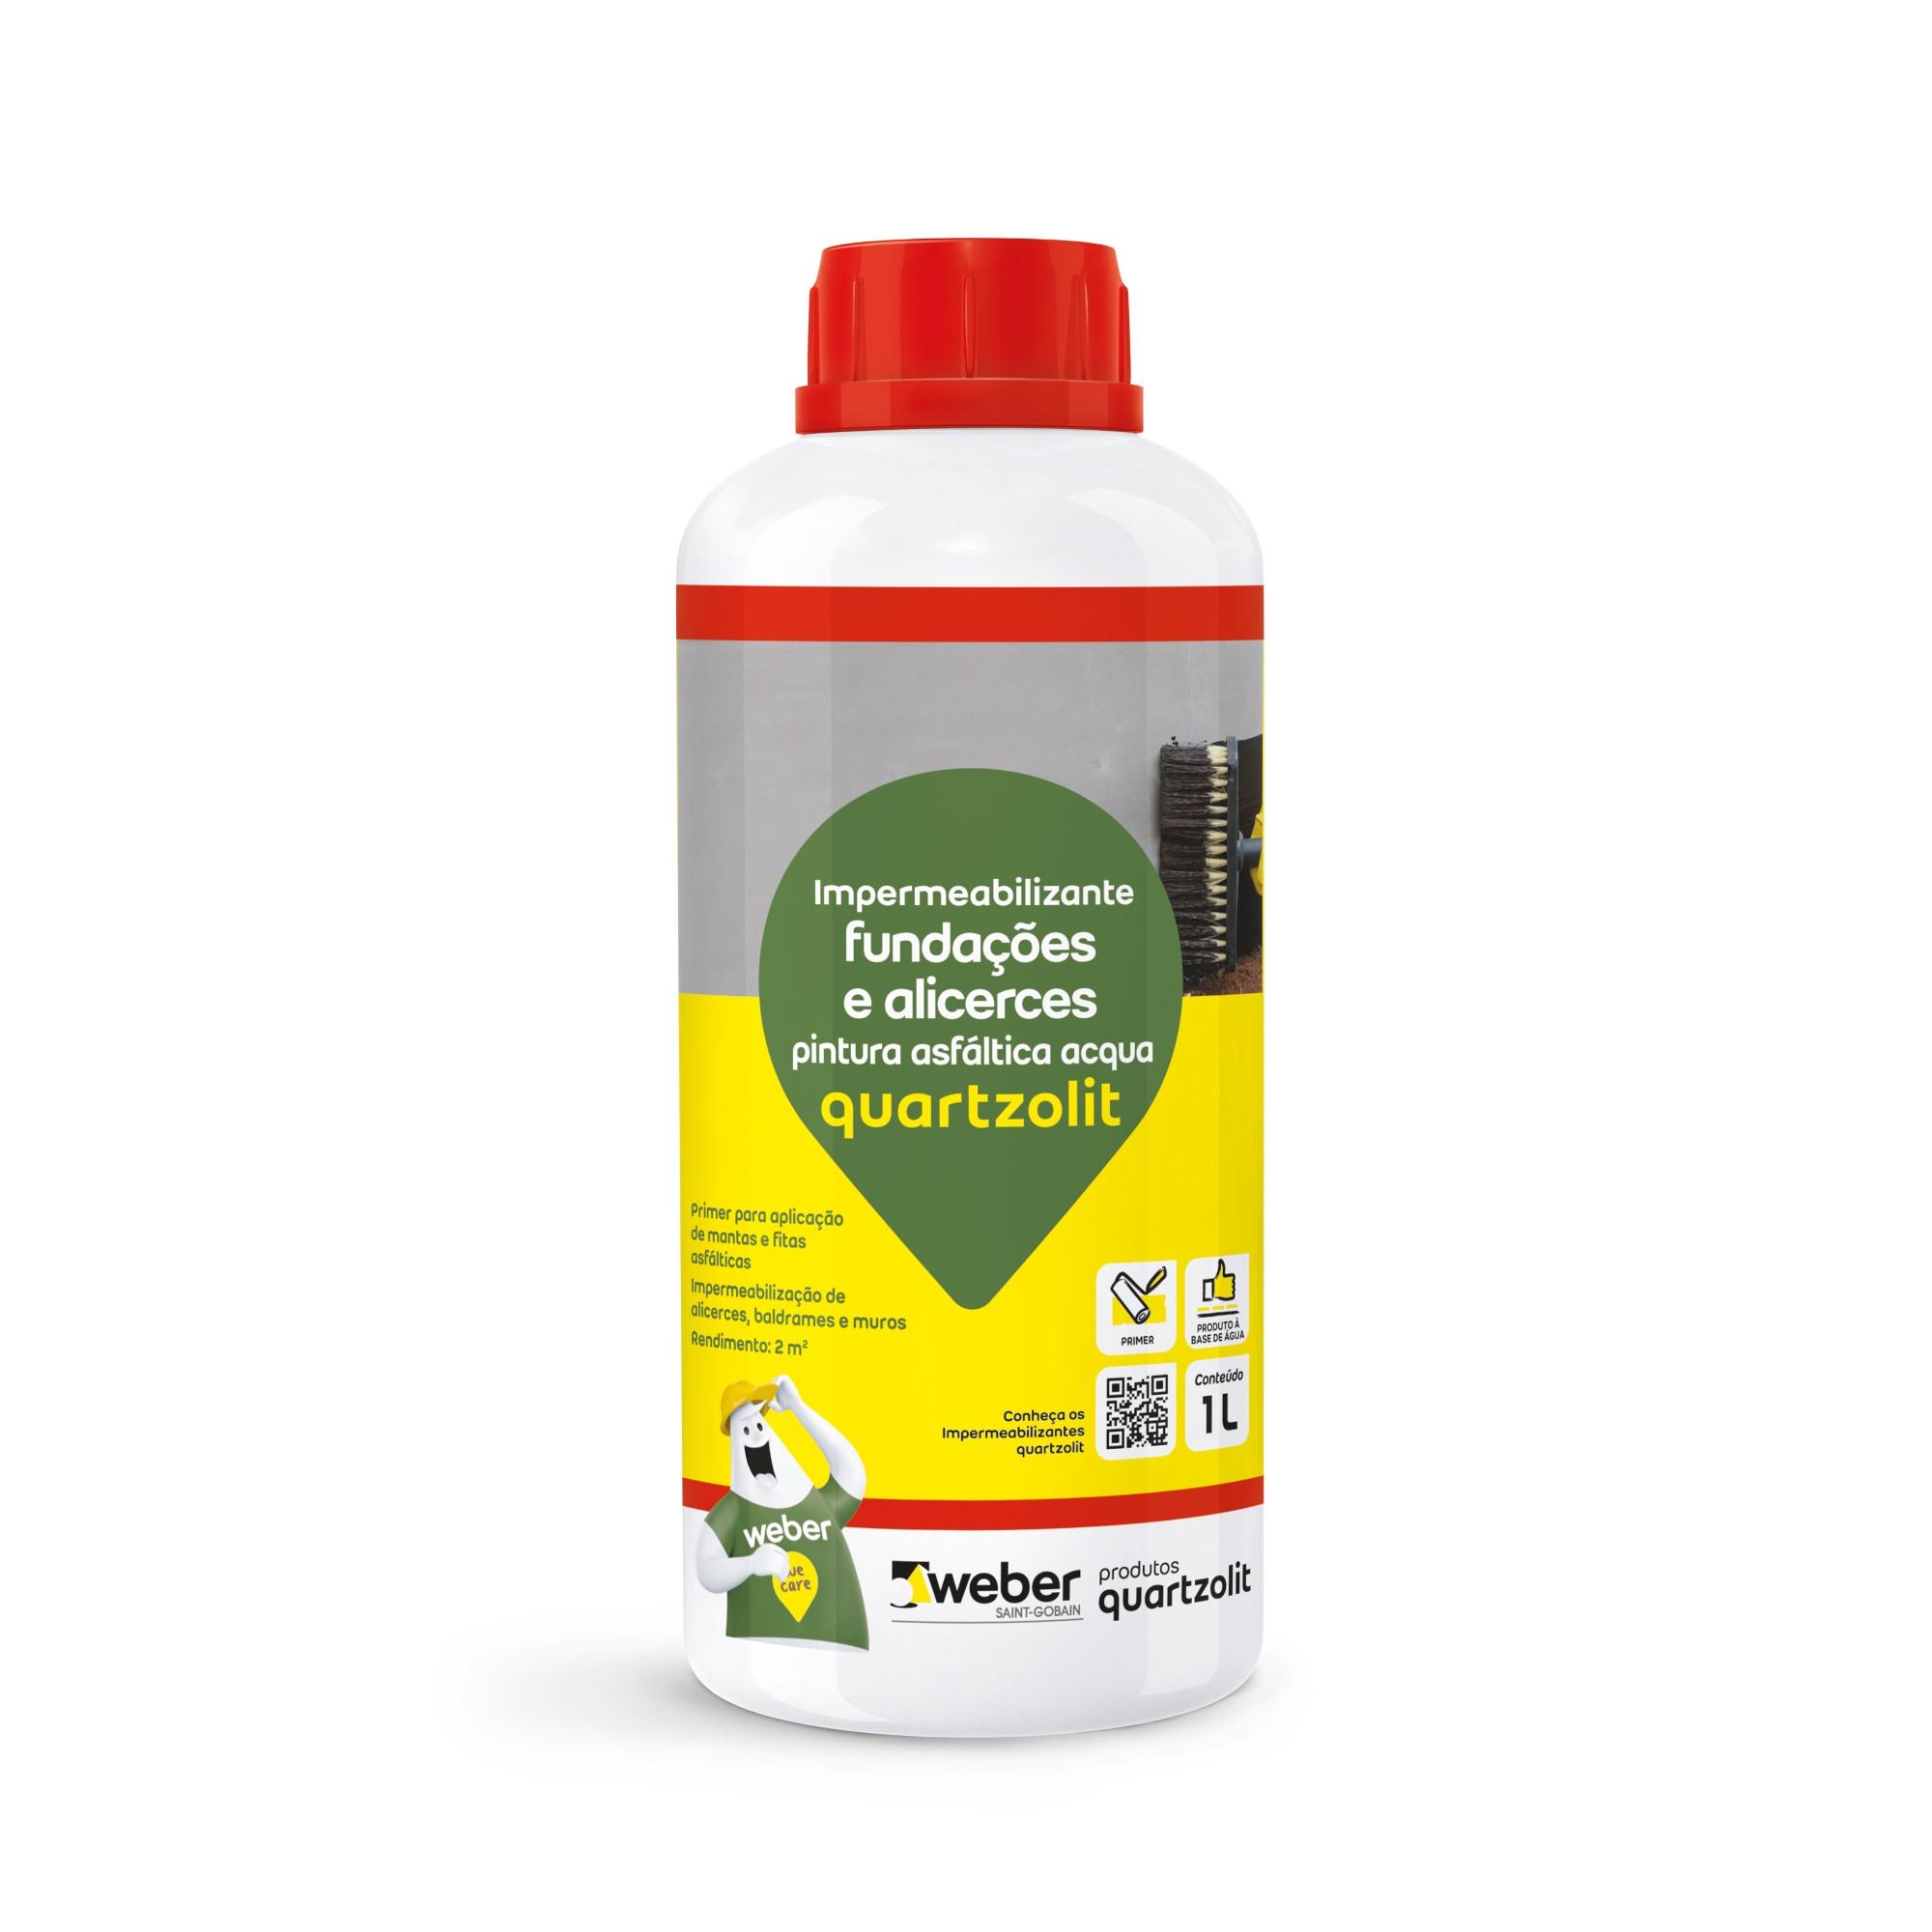 Impermeabilizante para Fundacoes e Alicerces Pintura Asfaltica Acqua 10 L - Quartzolit